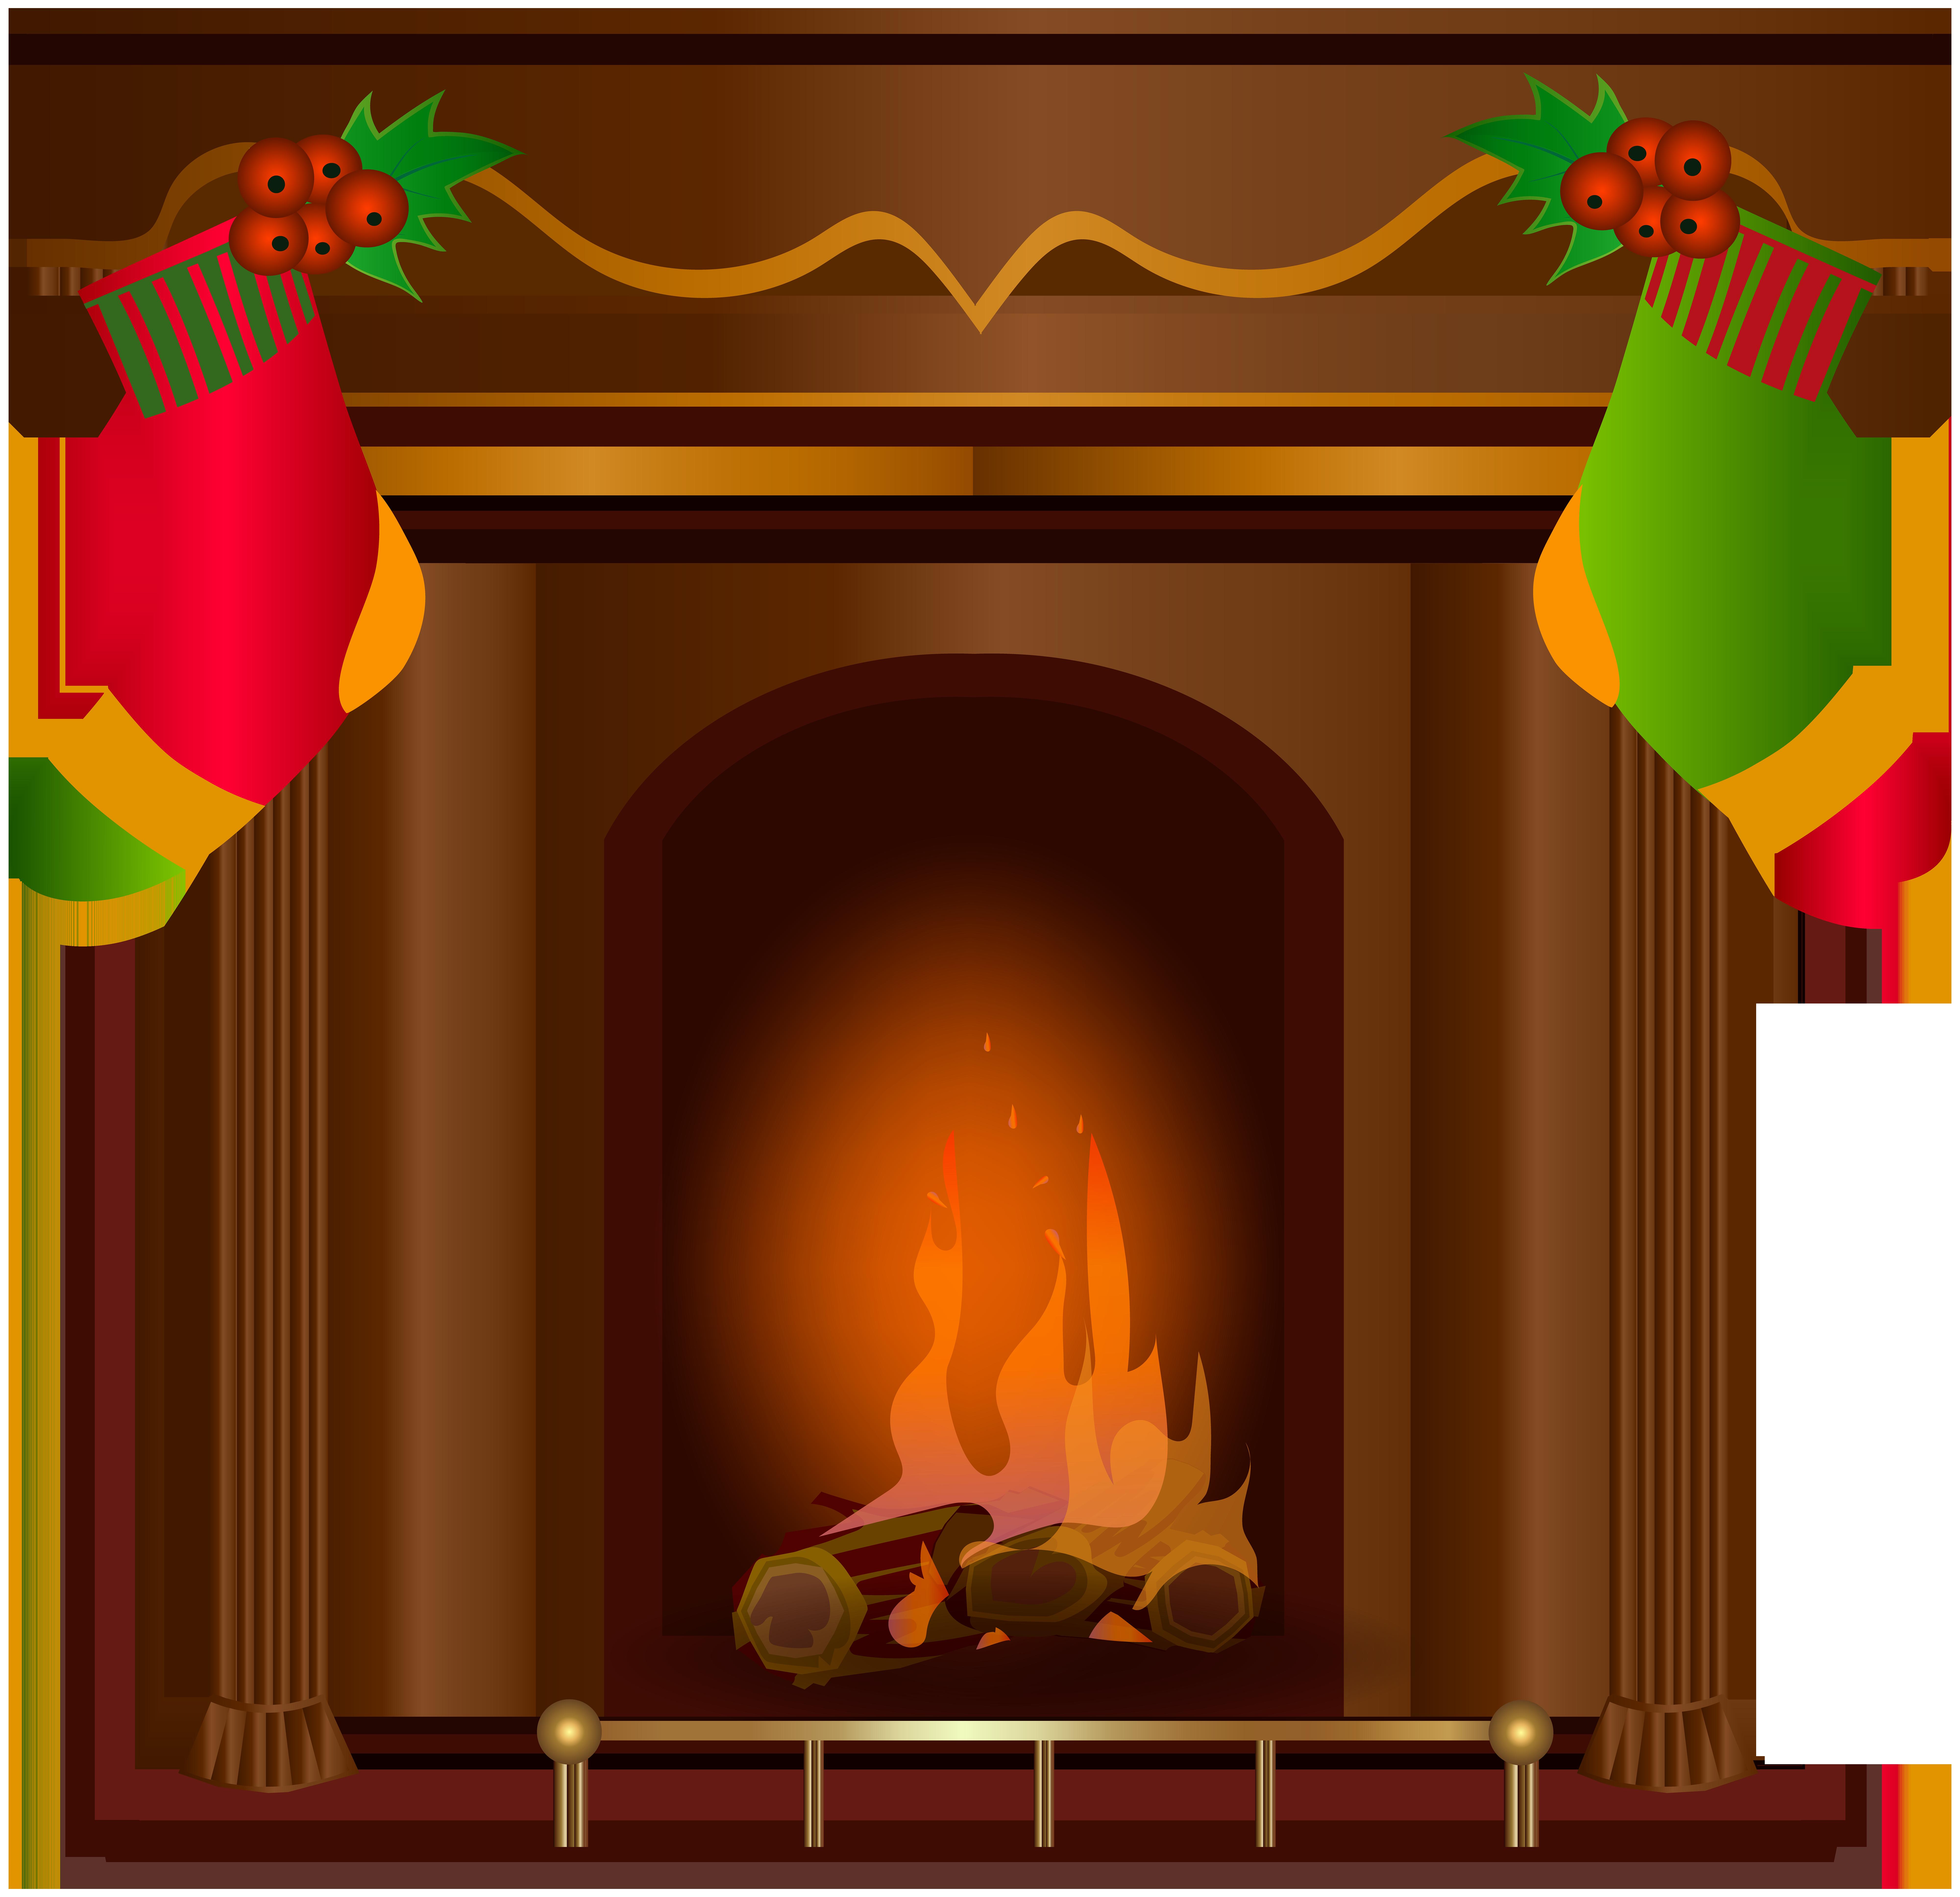 Fine Transparent Christmas Fireplace Clipart 8000X7743 Clip Art Home Interior And Landscaping Dextoversignezvosmurscom